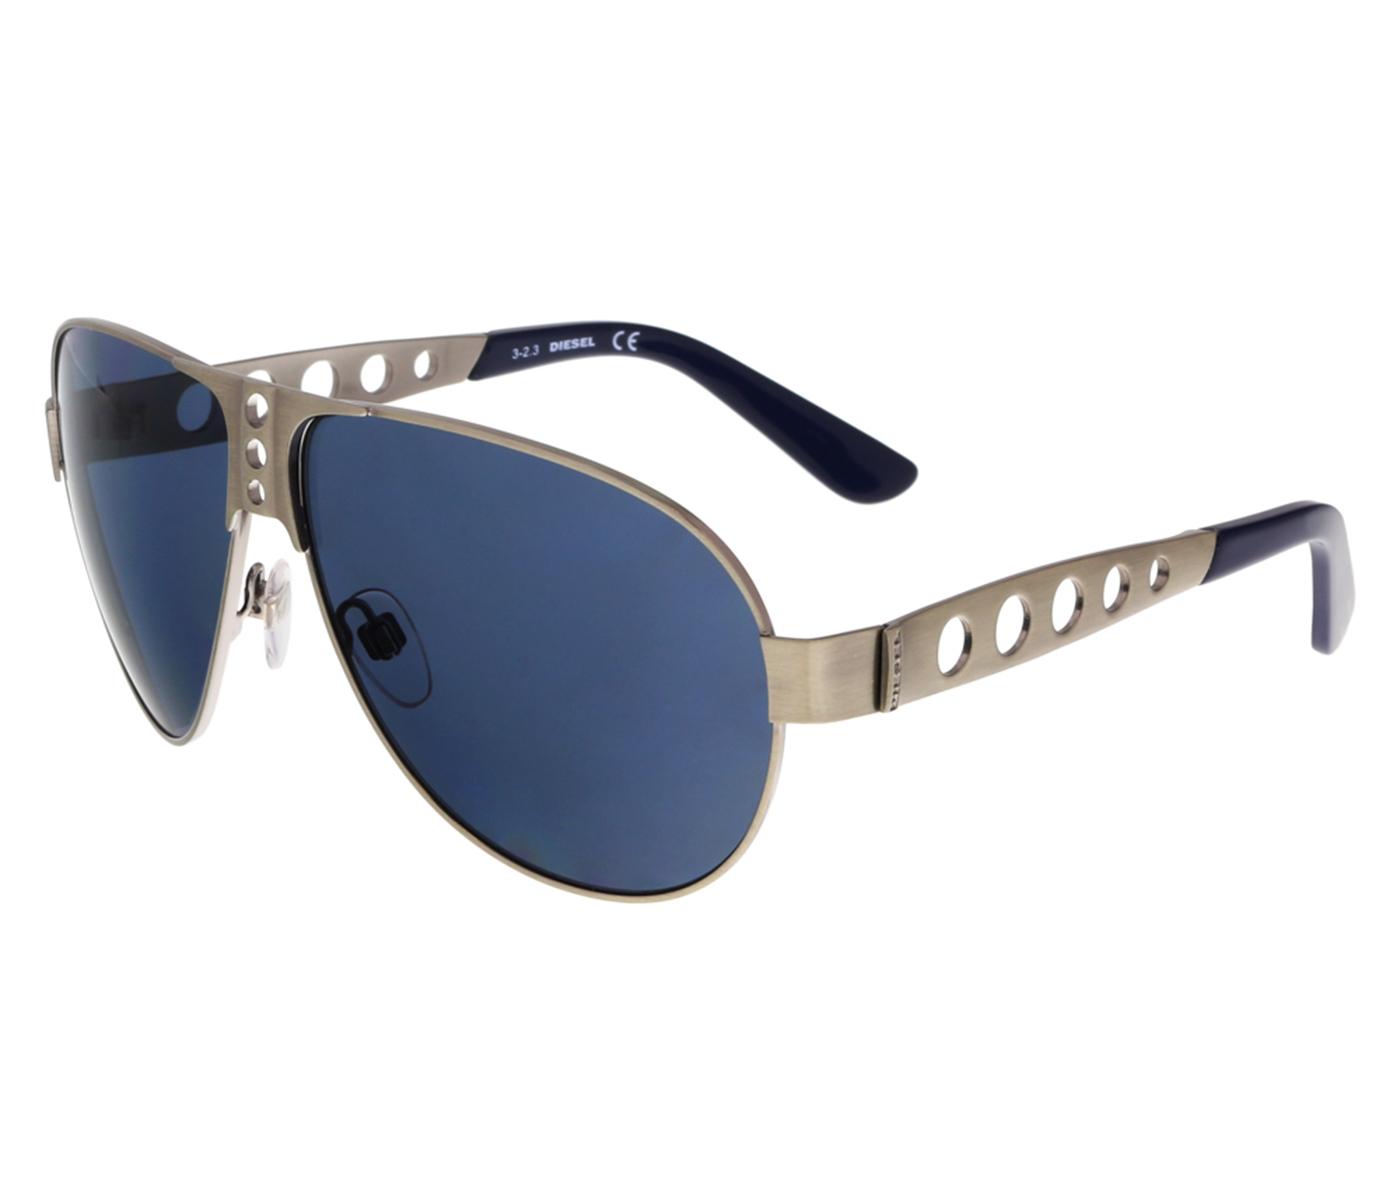 Diesel DL0092 15V Silver Aviator Sunglasses